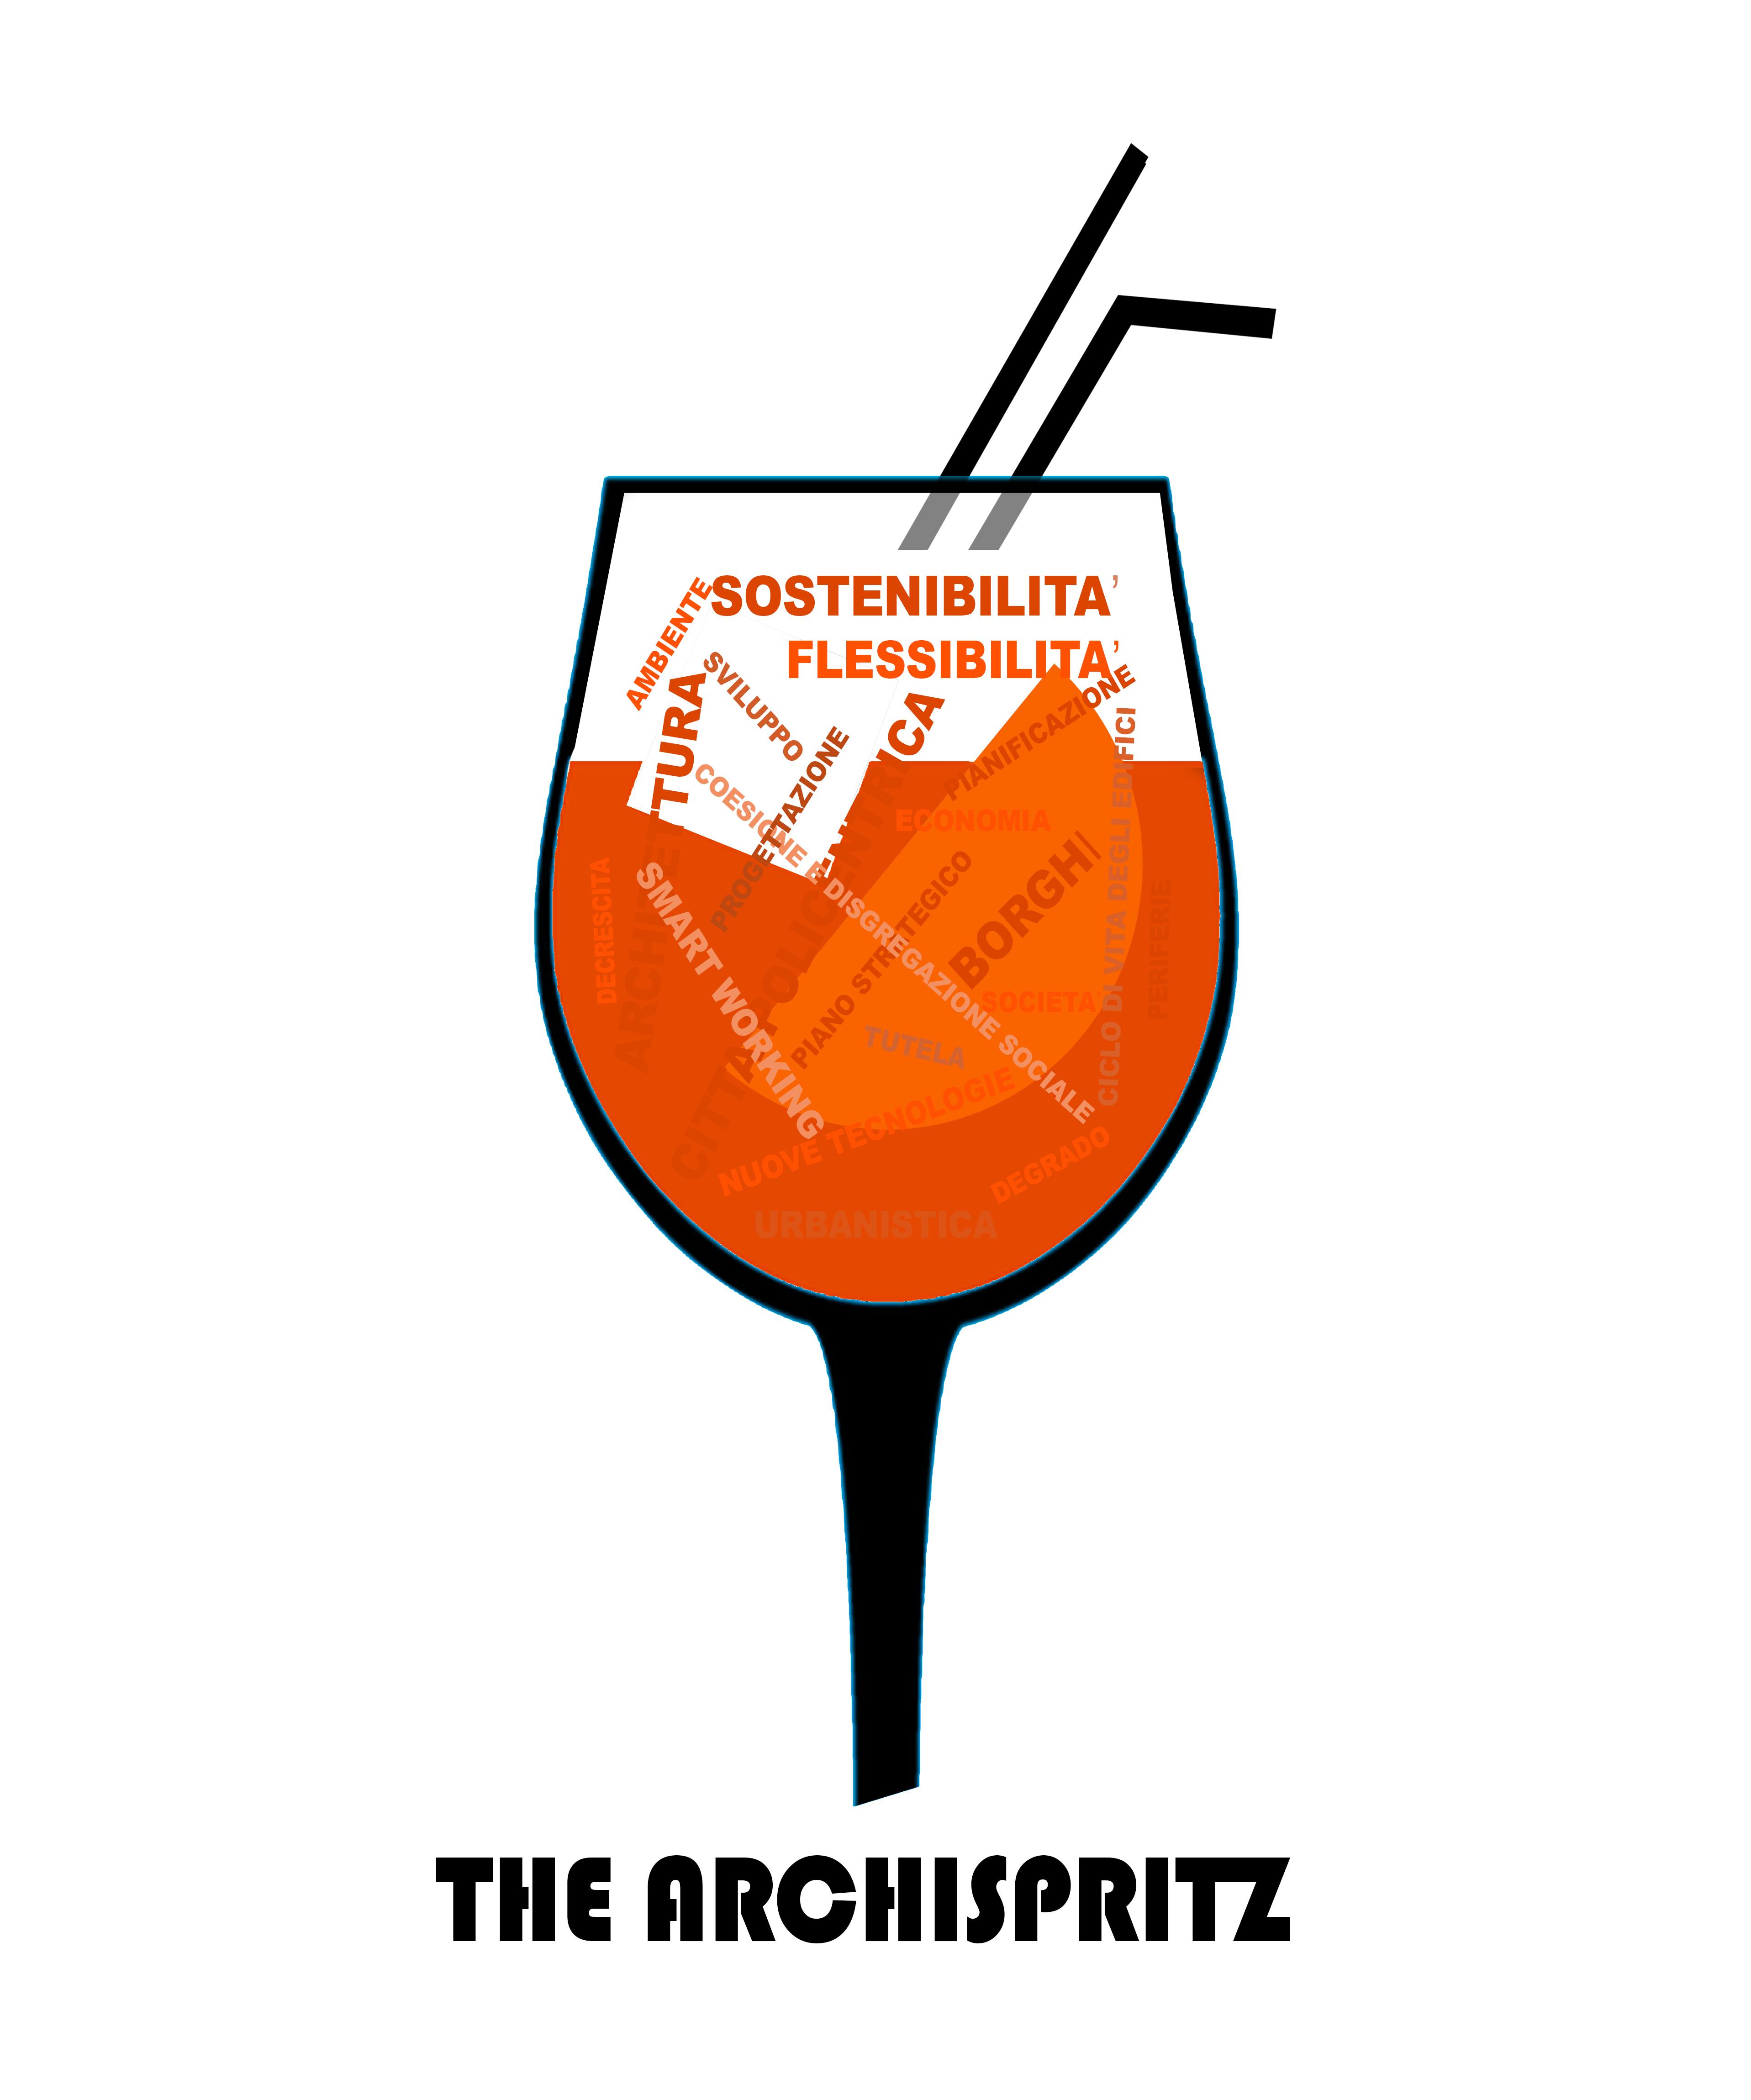 archispritz-webinar-architettura-design-diffusion-world